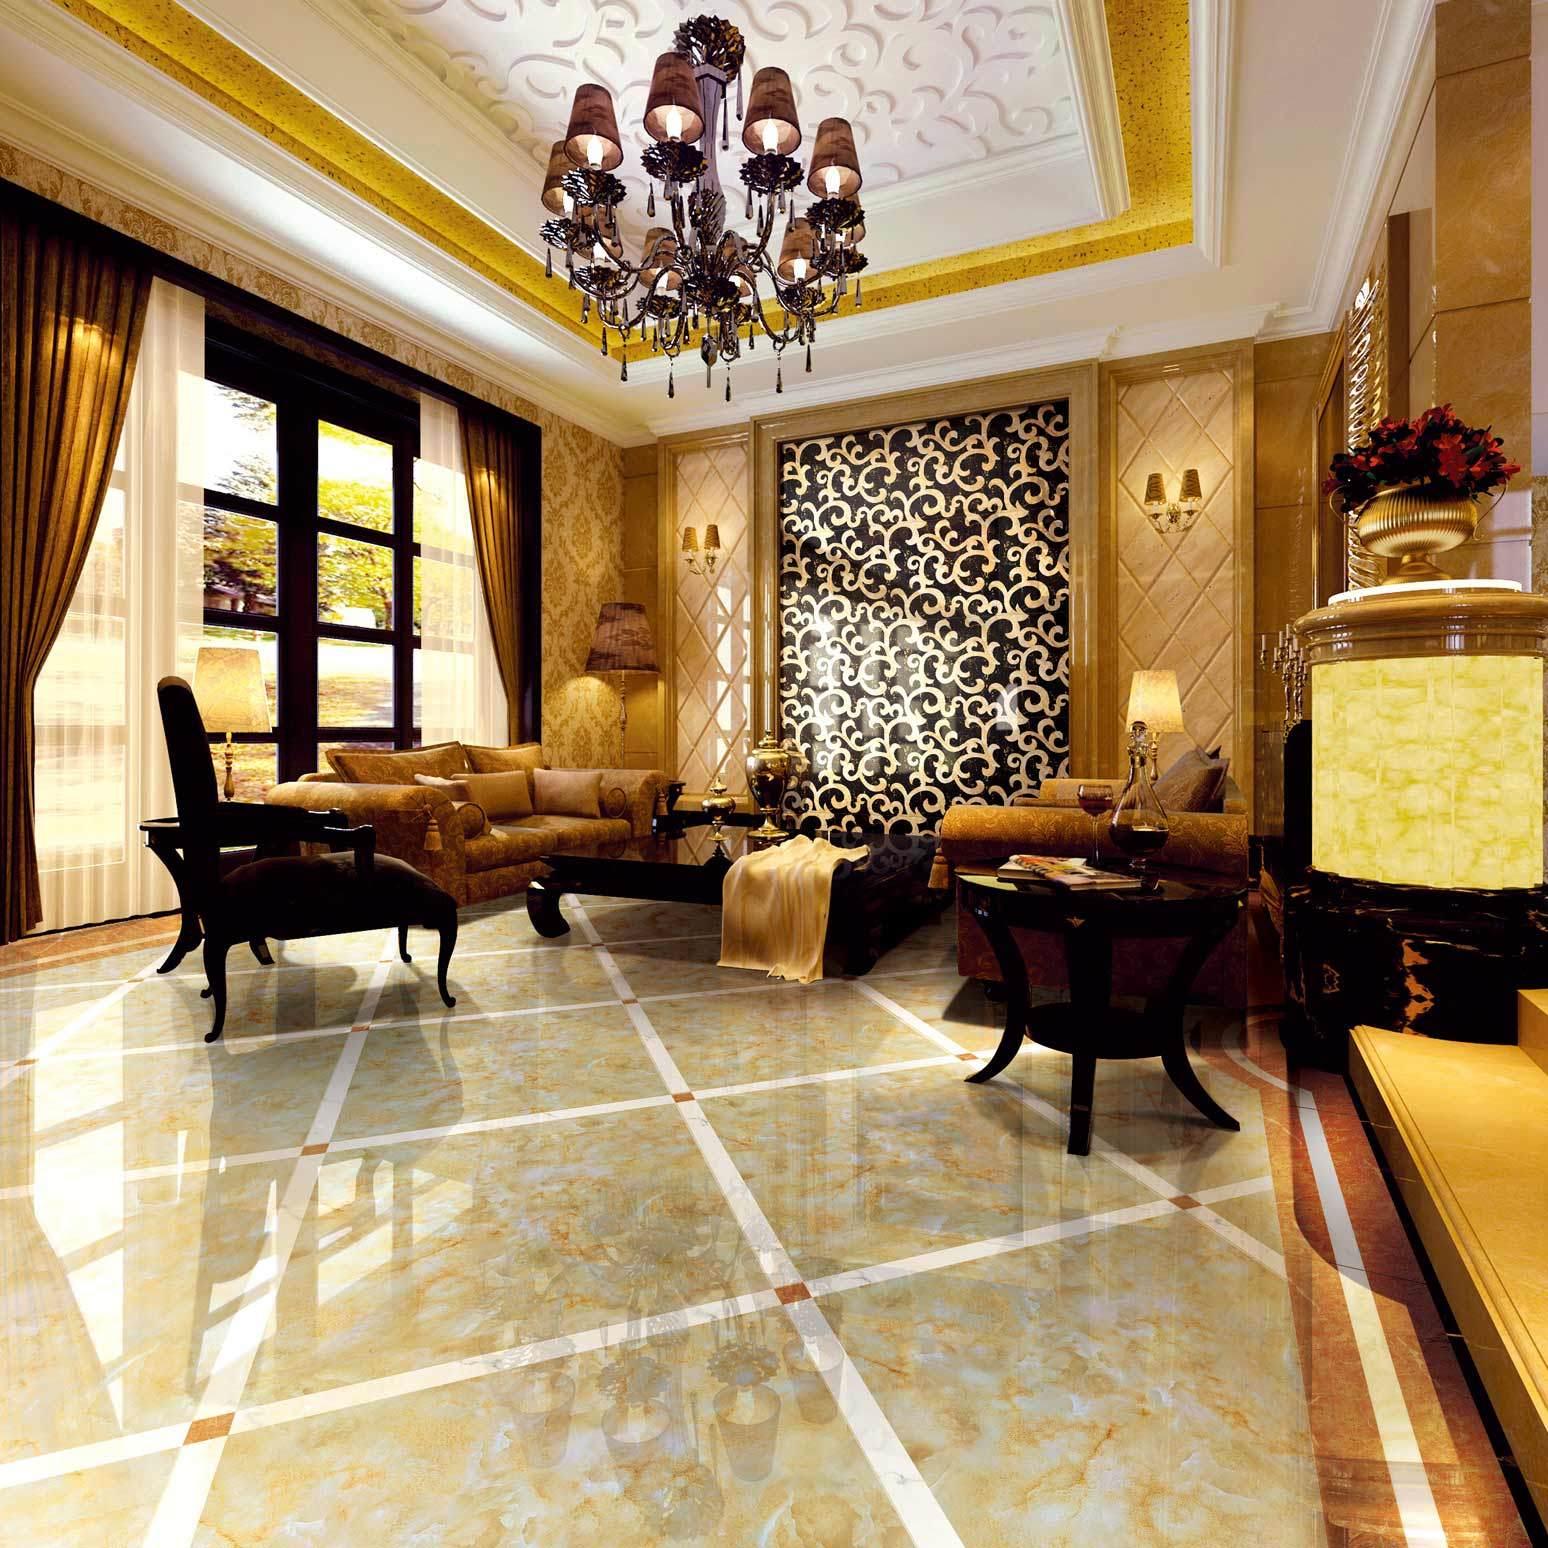 Burma Jade Colorful Marble Tile Romanio High-End Royal Luxury Dining Living Room